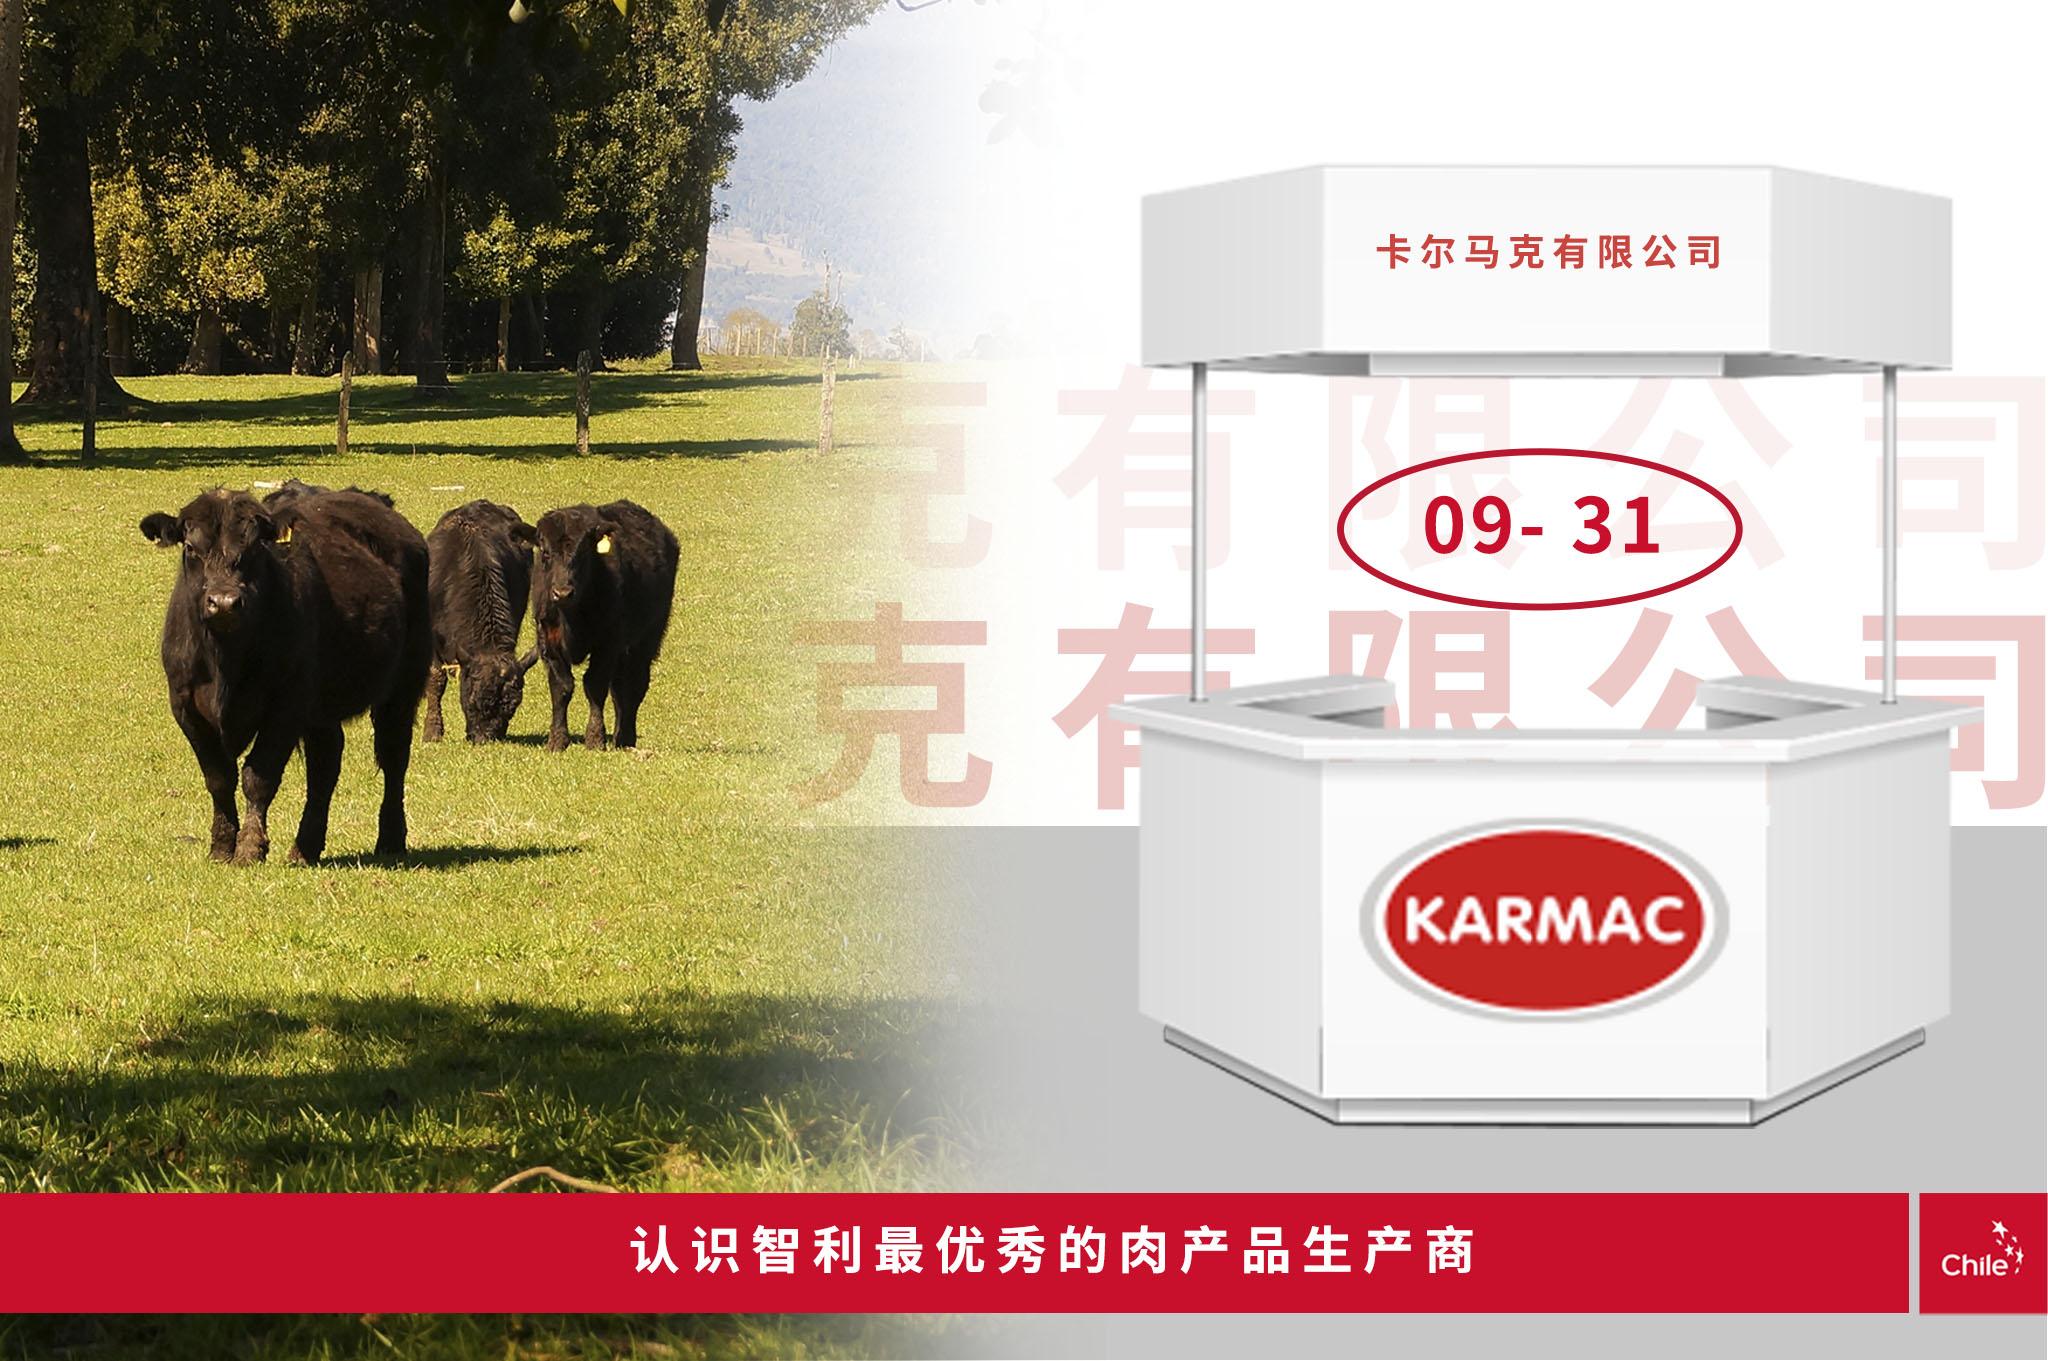 http://faenacar.cl/feriavirtual/wp-content/uploads/2020/11/StandsKarmac.jpg